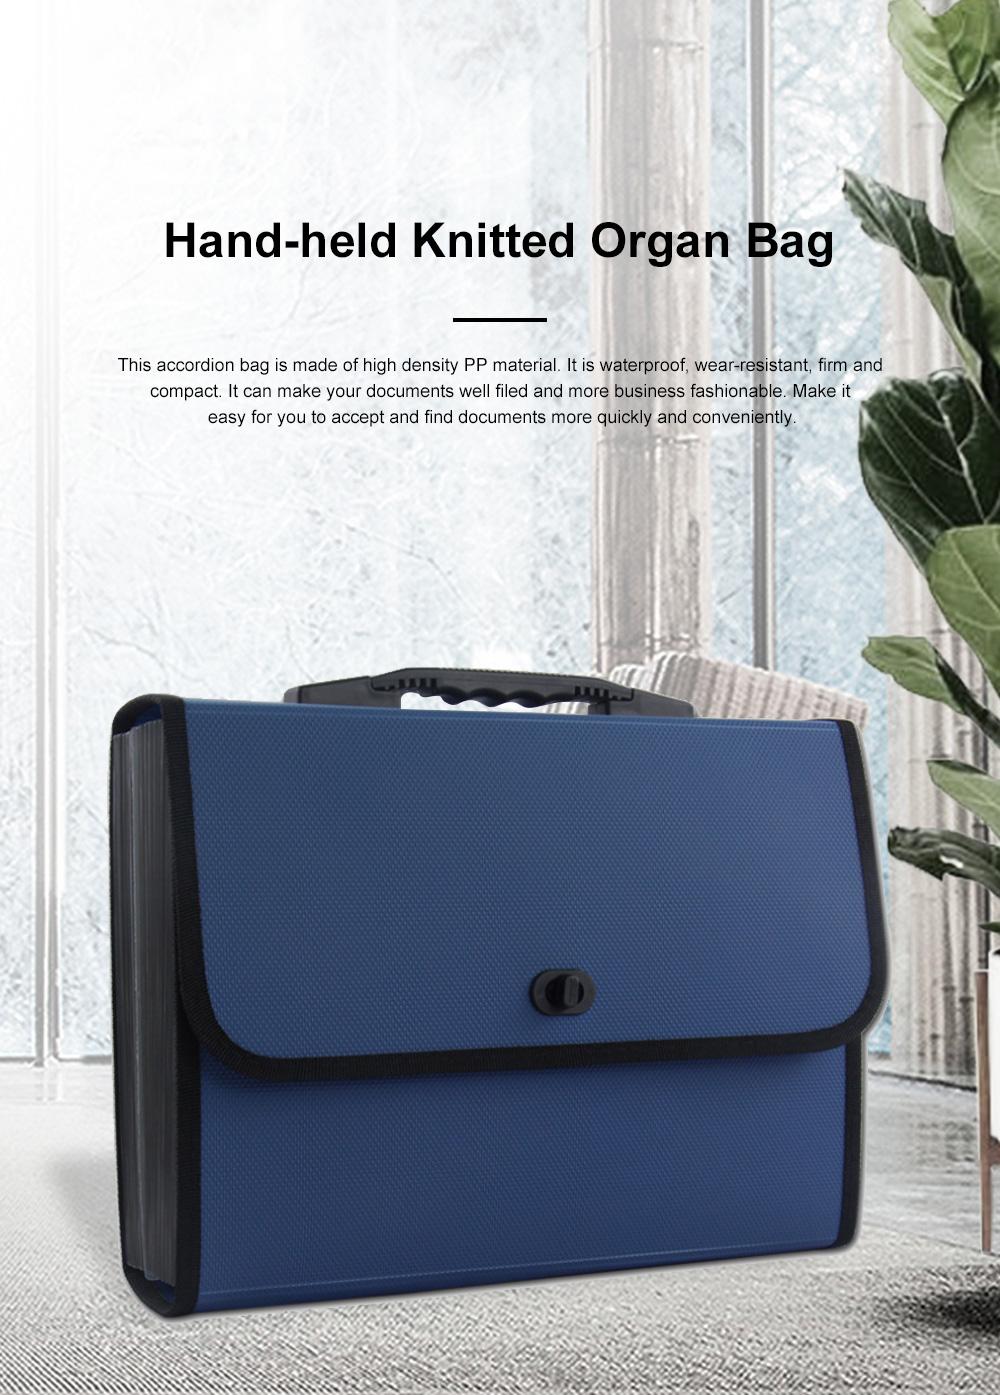 Portable Hand-held Knitted Organ Bag 26-tier Multi-tier Folders Office File Bag Paper File Bag 0